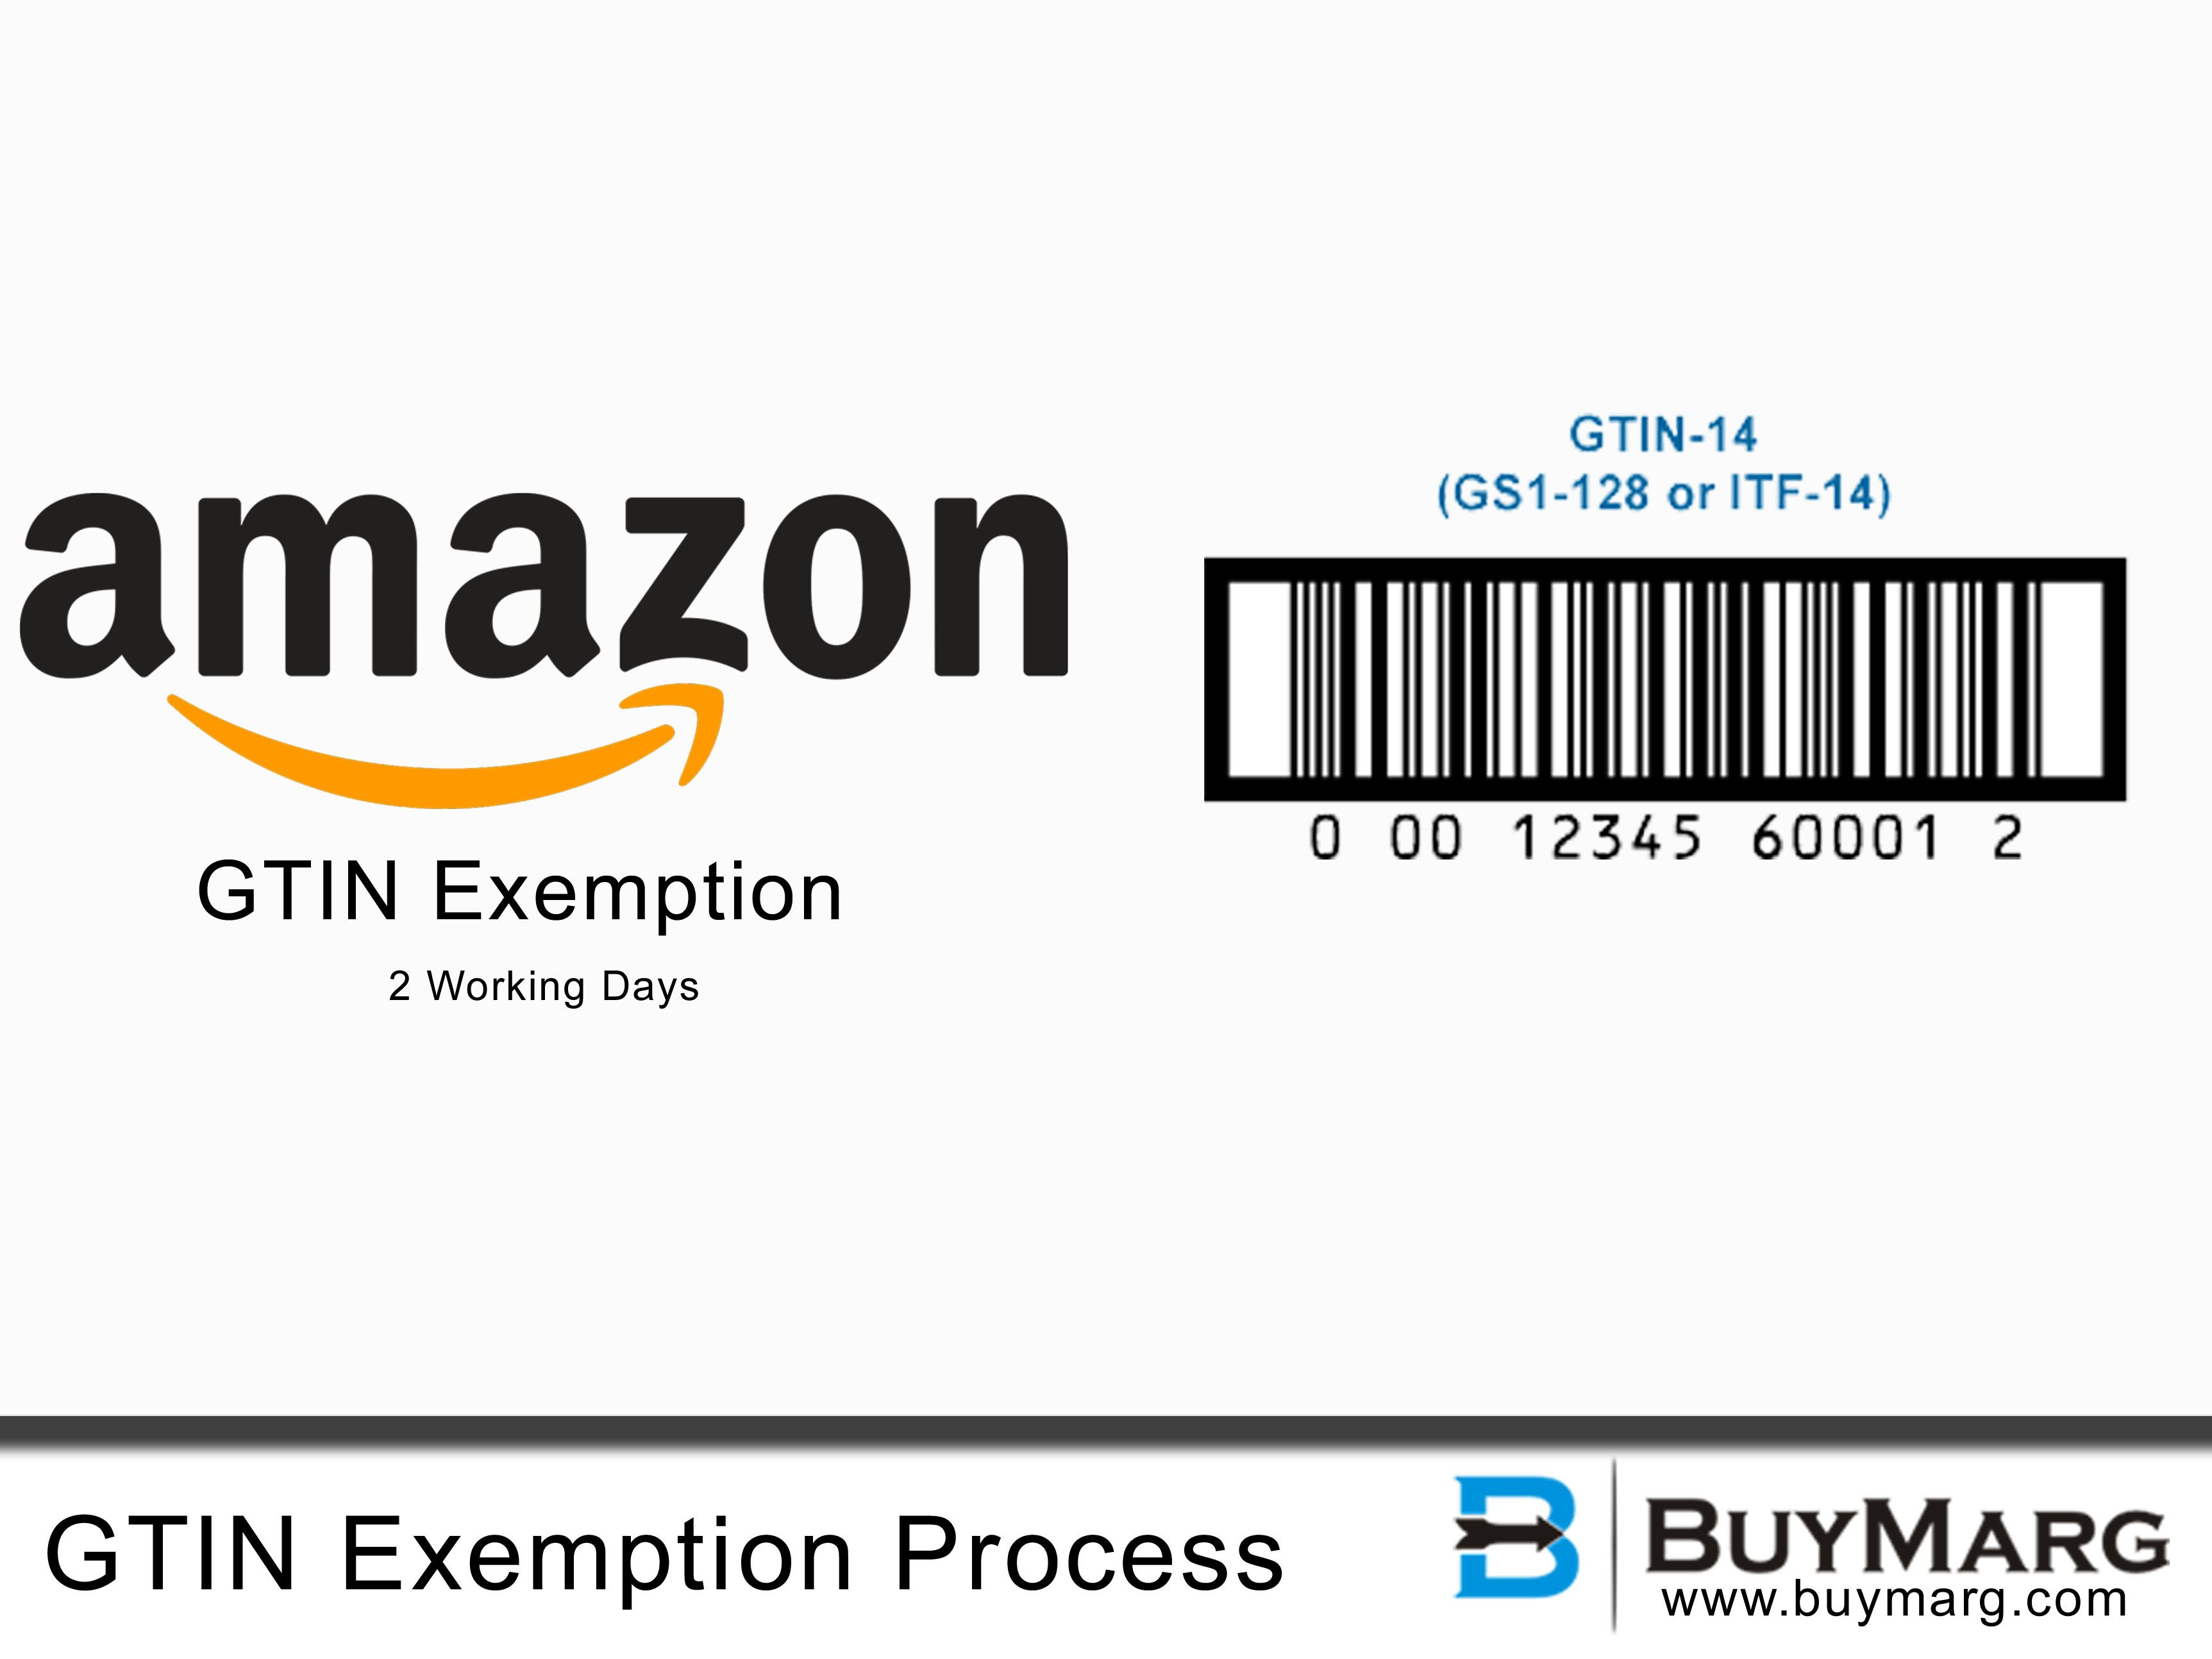 GTIN Exemption Process